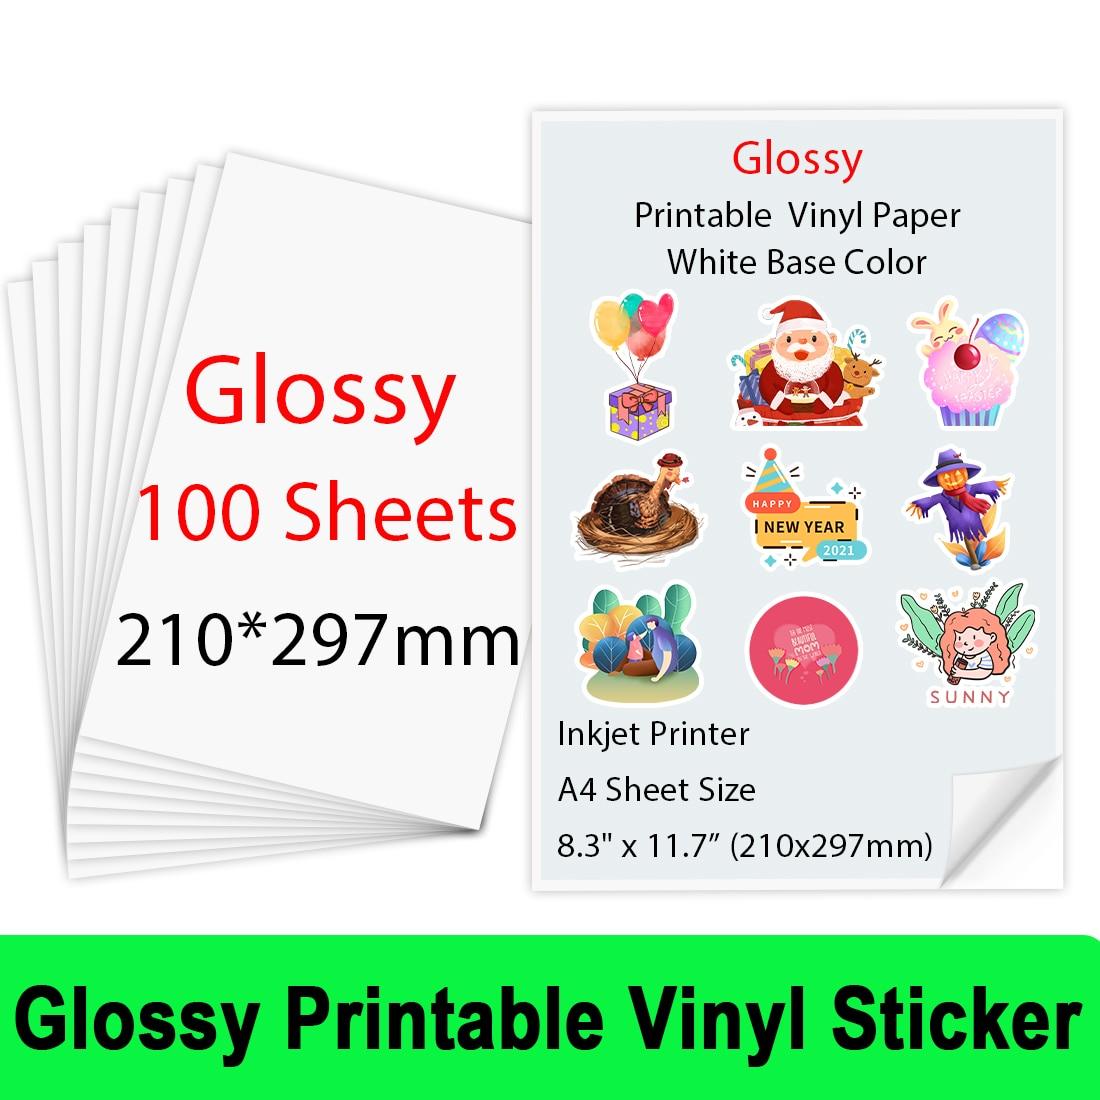 100Sheets A4 210*297mm Glossy Printable Vinyl Sticker Paper for Inkjet printer Self-Adhesive Inkjet Printer Paper Copy Paper